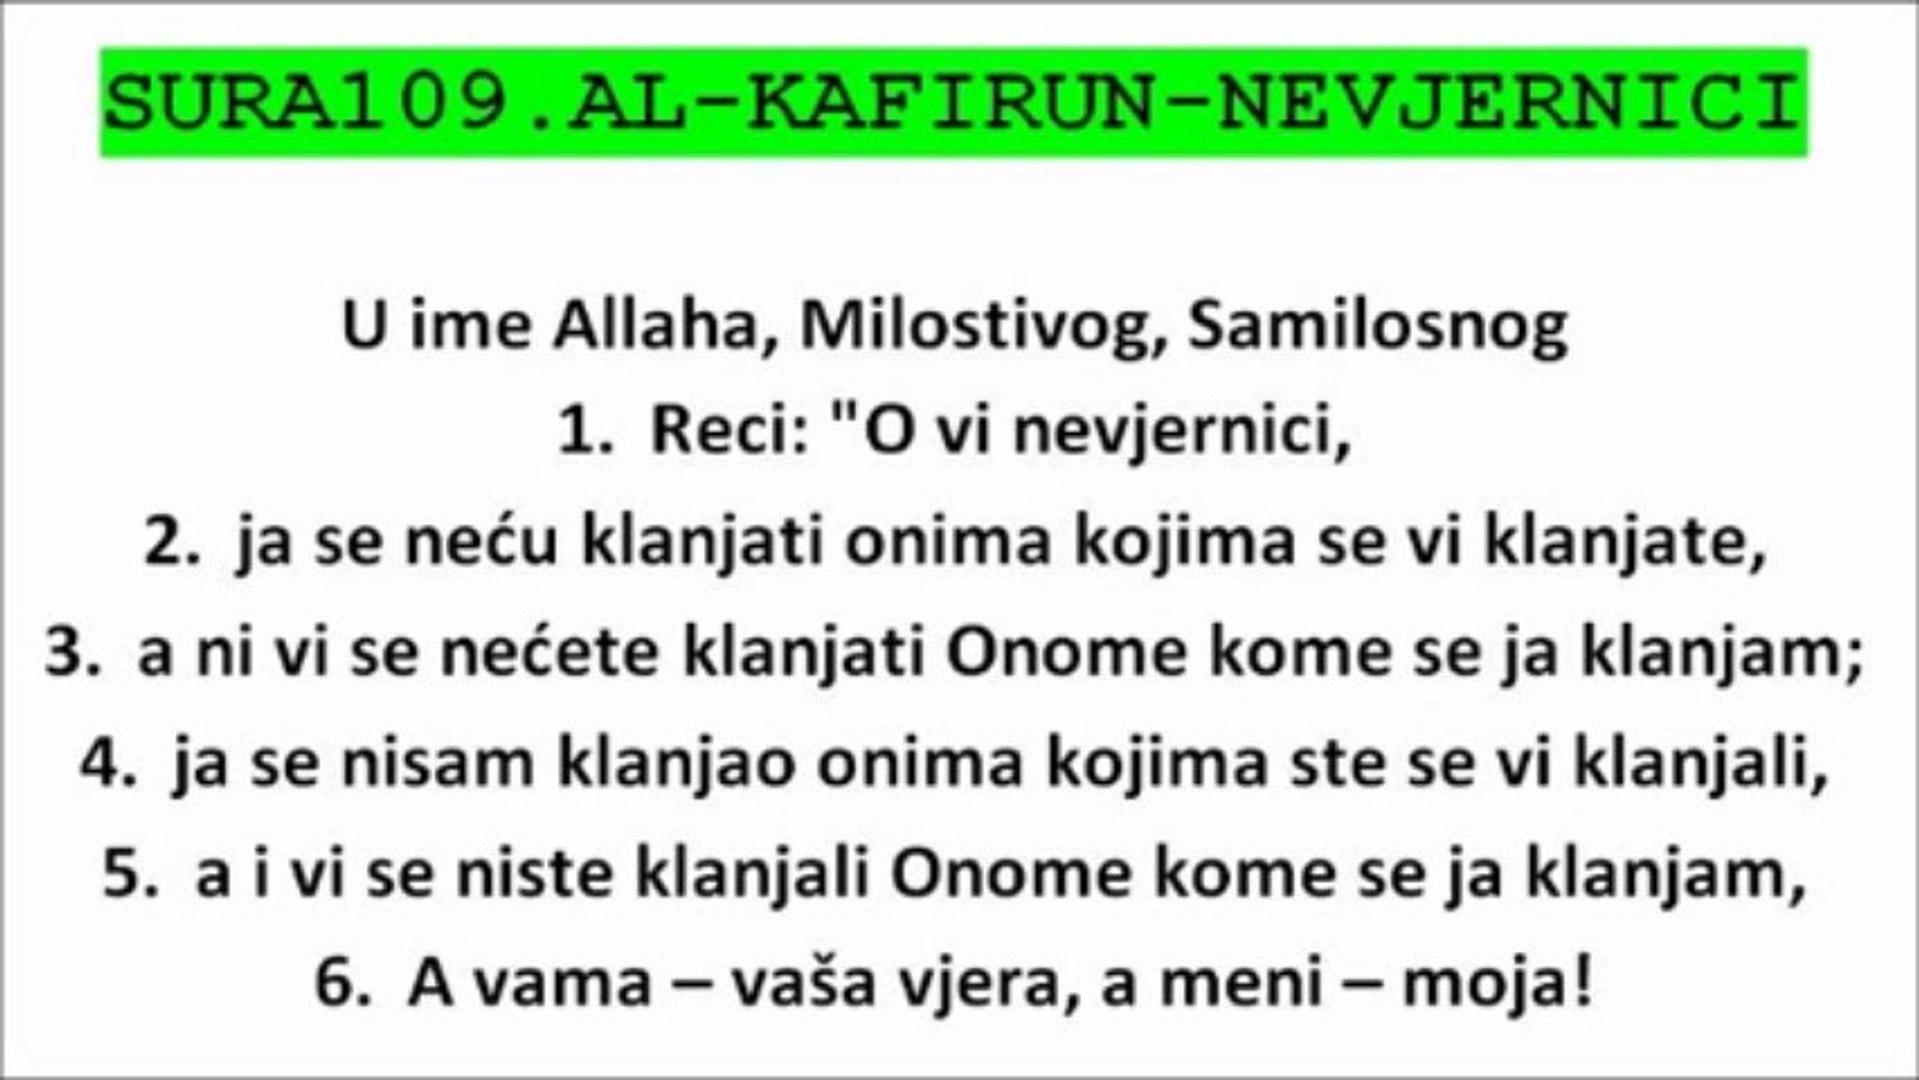 SURA109.AL-KAFIRUN-NEVJERNICI - KUR'AN NA BOSANSKOM JEZIKU THE HOLY QUR'AN IN BOSNIAN